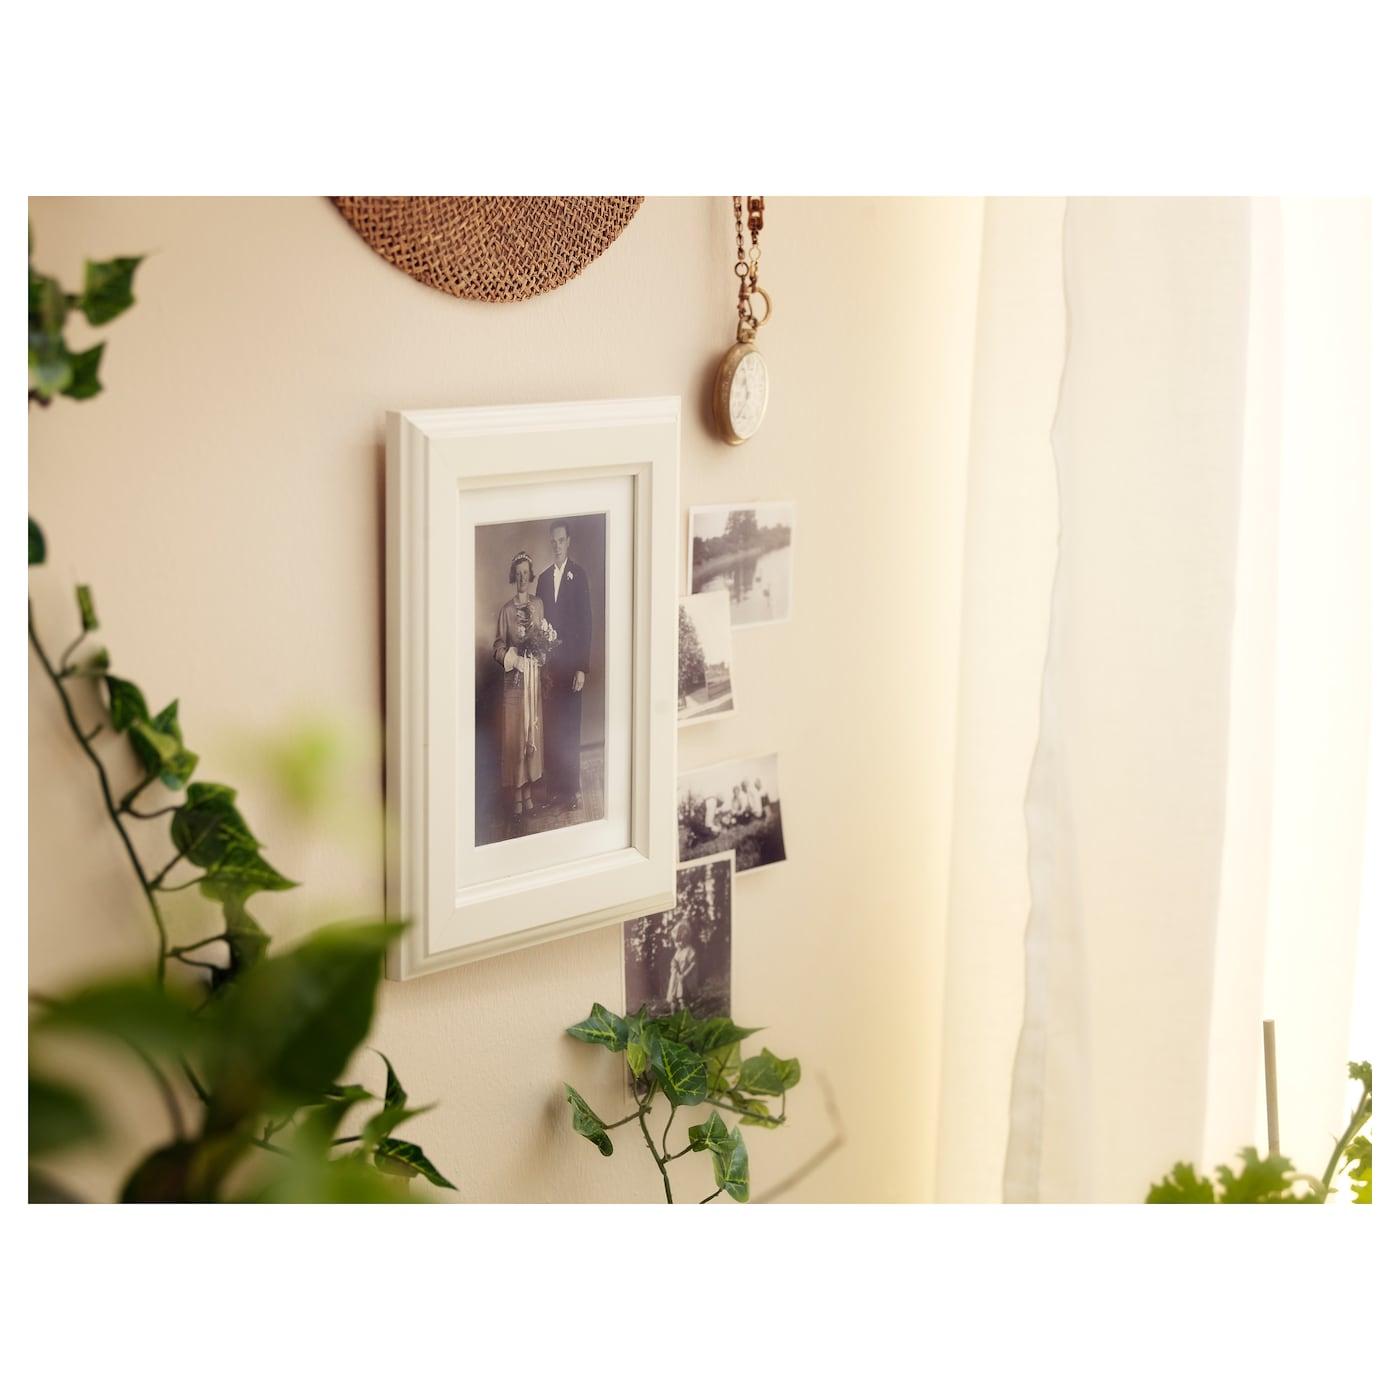 VIRSERUM Frame White 13x18 cm - IKEA